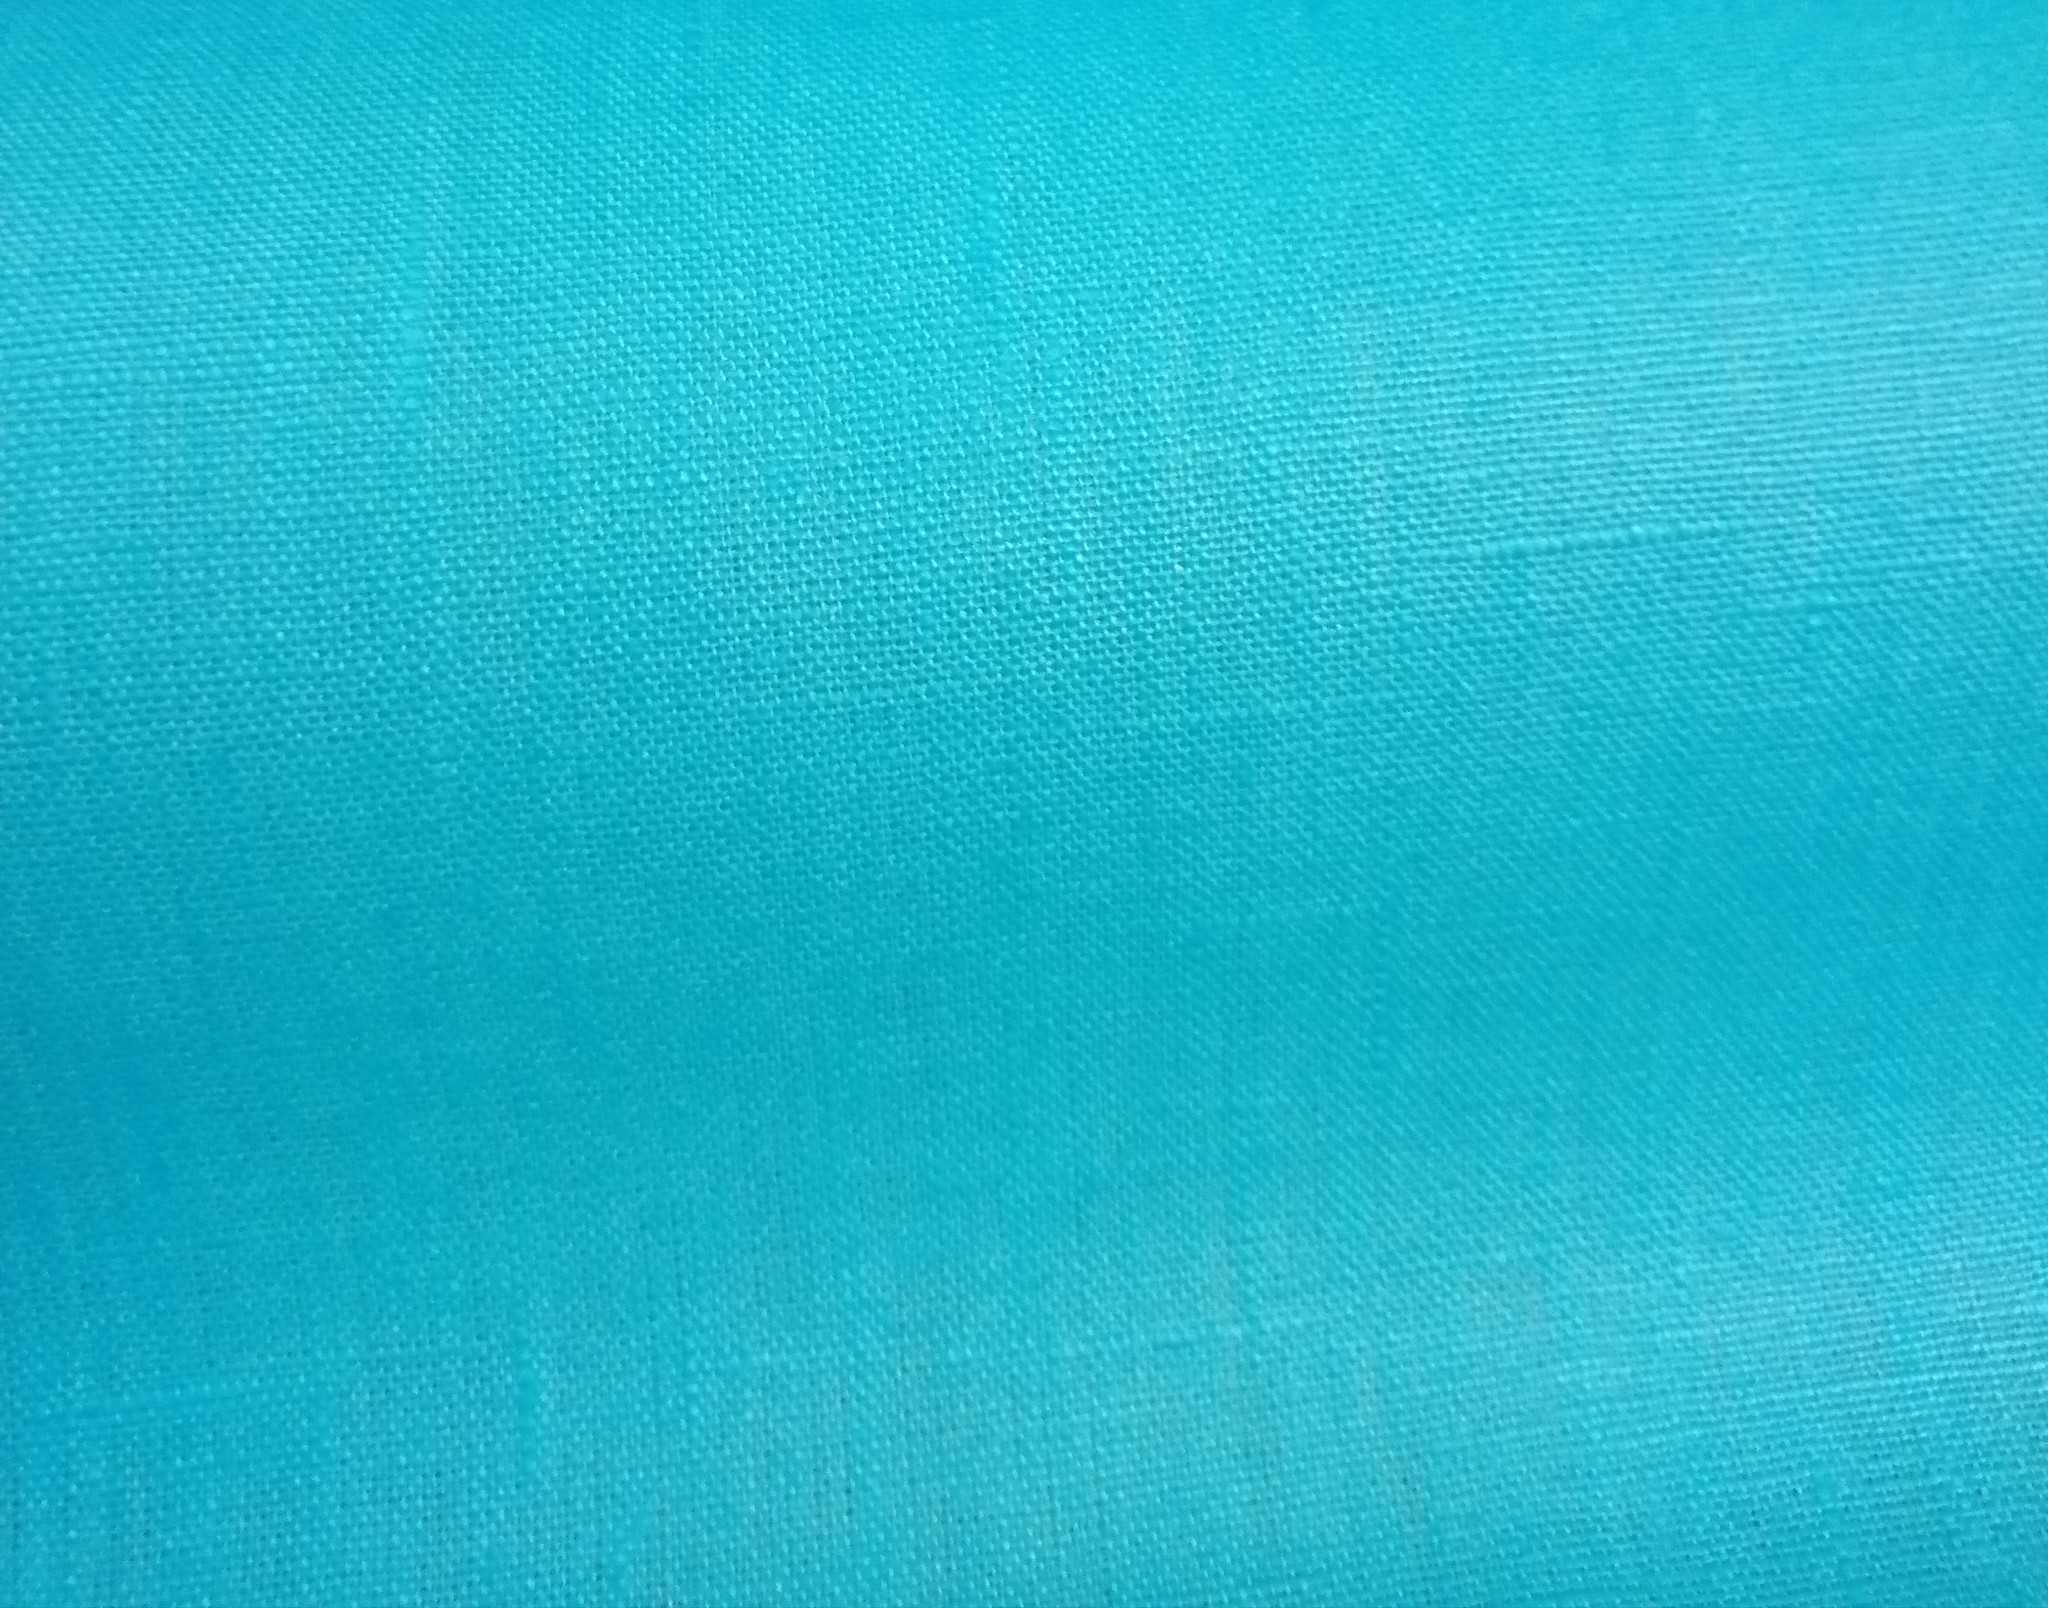 cyan blue  coated linen